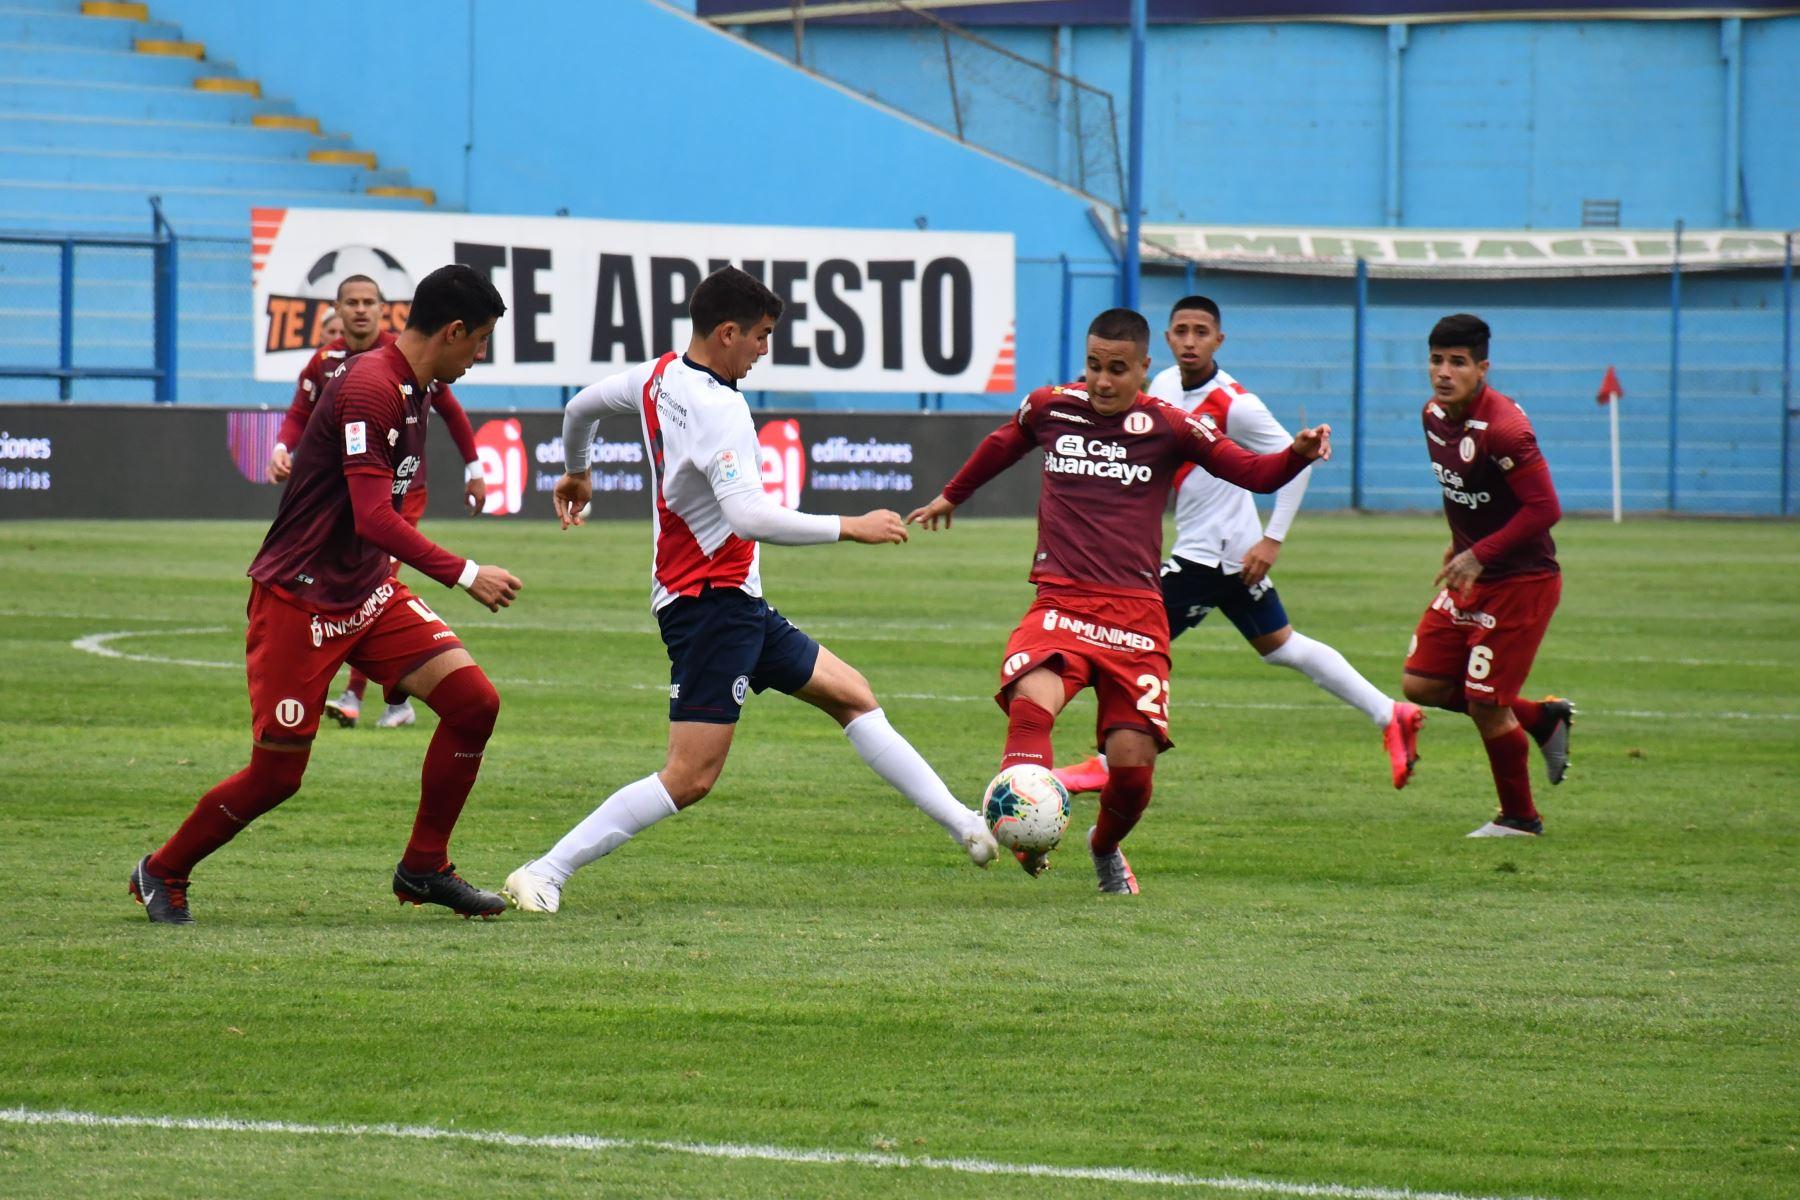 Universitario golea 5-0 a Municipal por la fecha 15 del Torneo Apertura de la Liga 1. Foto: FPF